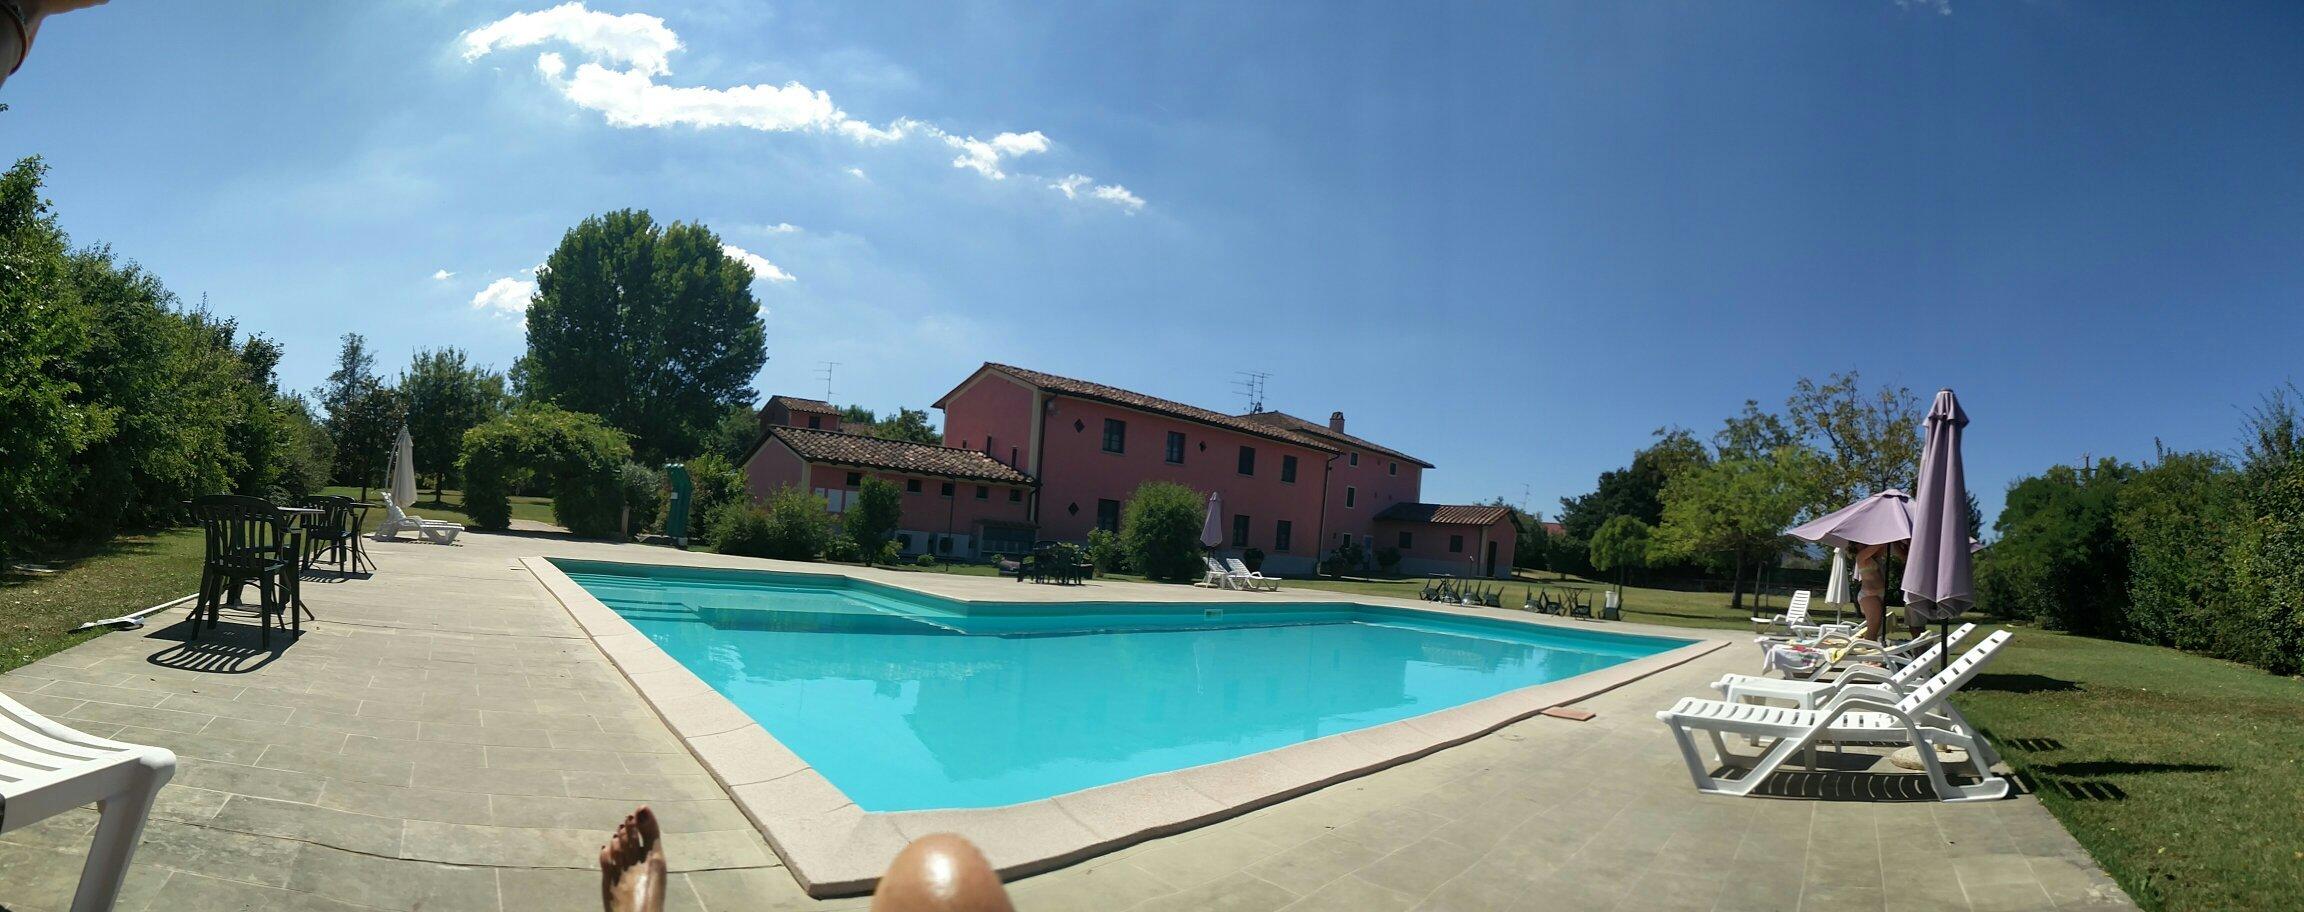 Antico Borgo de' Romolini